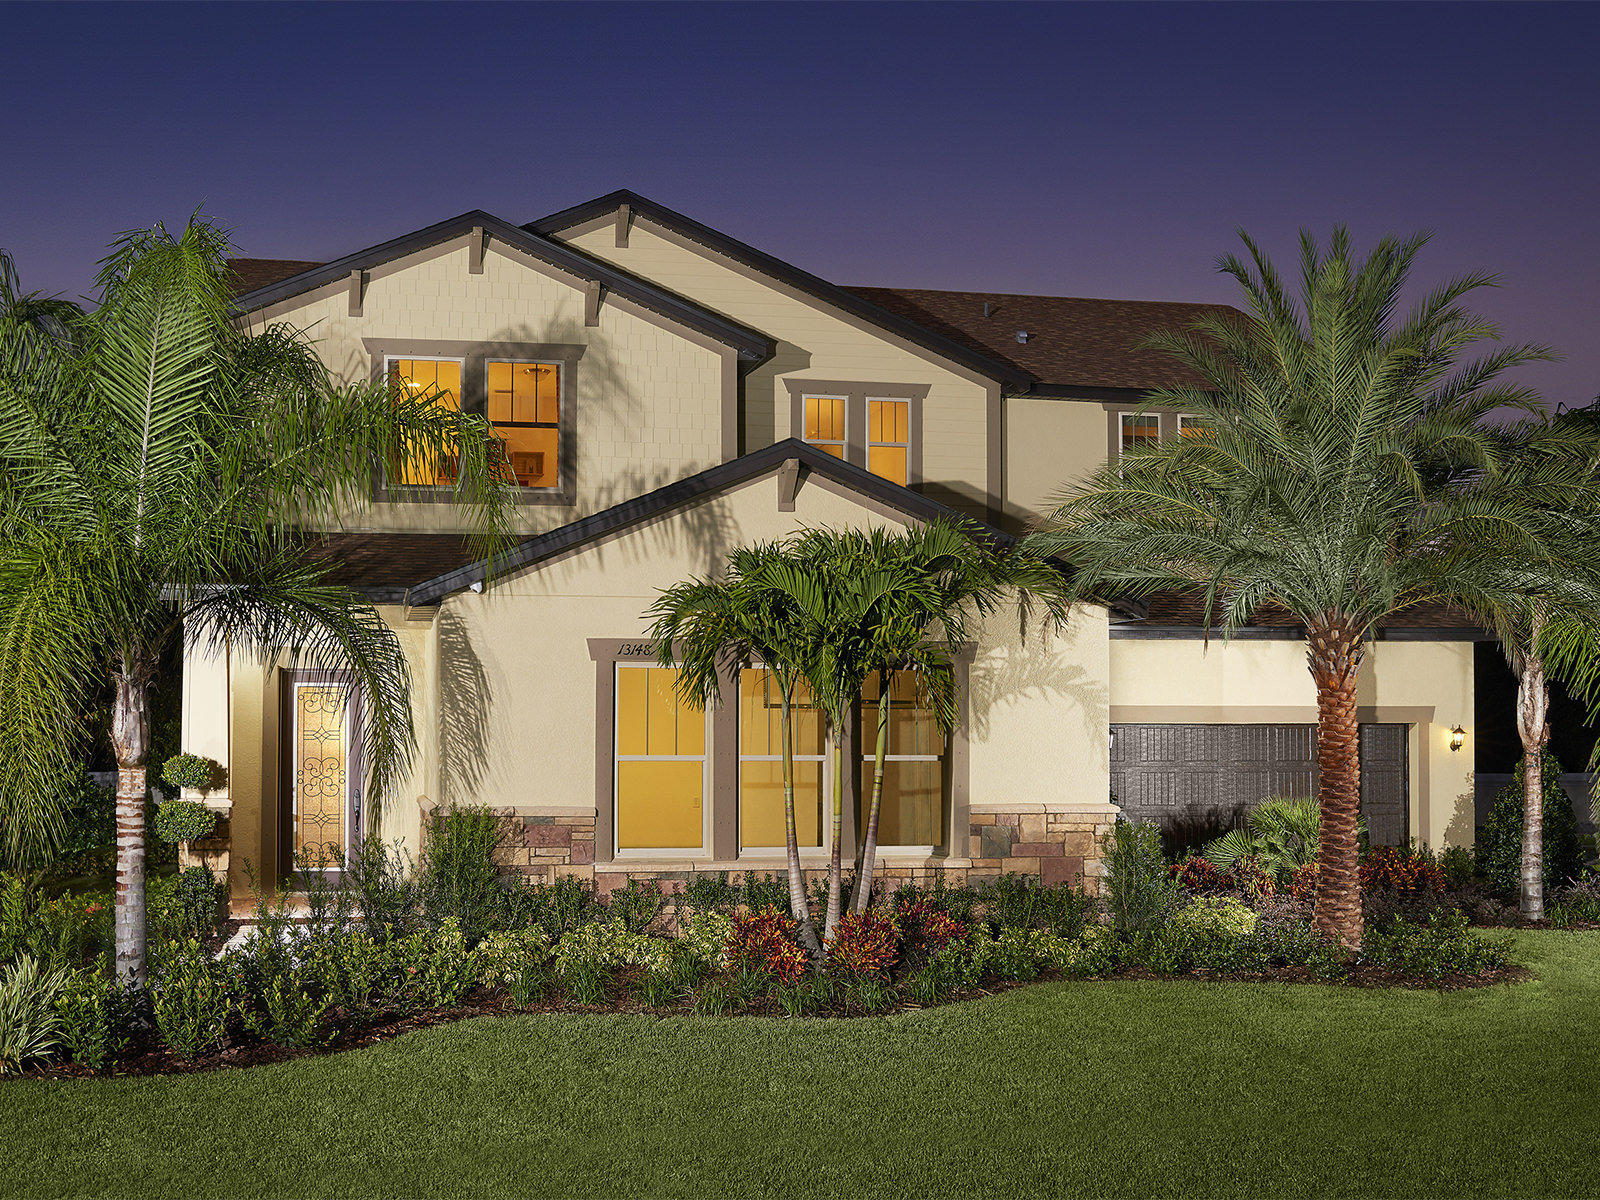 Free Service for Home Buyers    Serenity Creek Bradenton Florida Real Estate   Bradenton Realtor   New Homes for Sale   Bradenton Florida